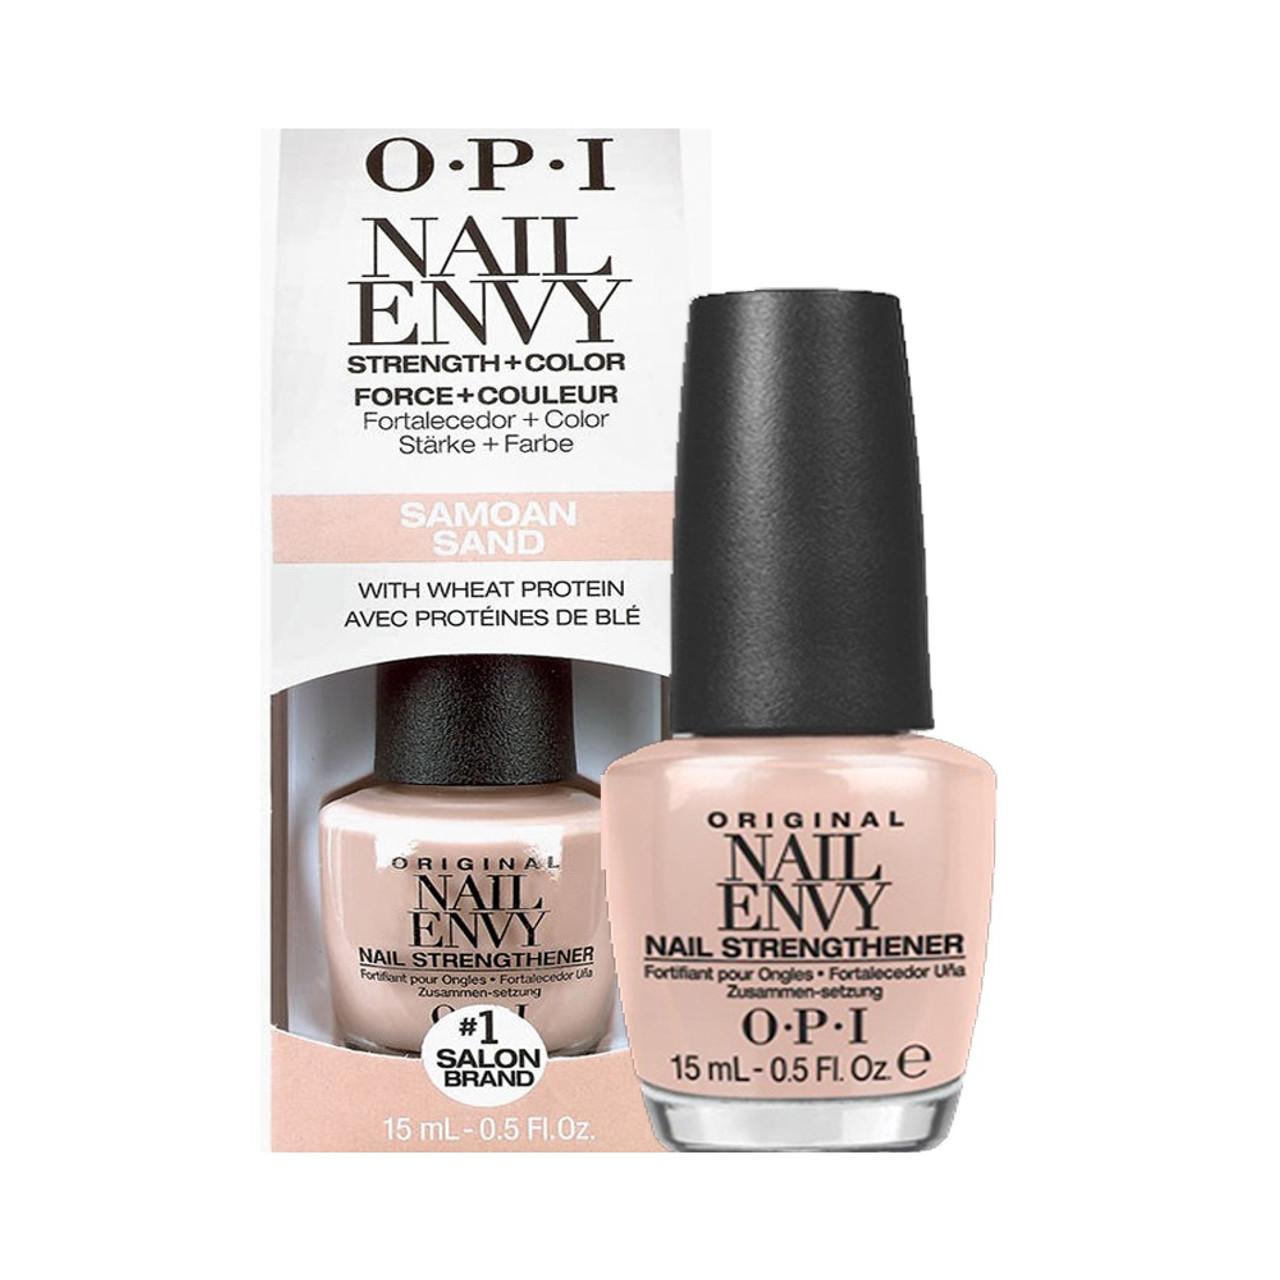 OPI NAIL ENVY | NAIL STRENGTHENER COLOR | SAMOAN SAND .5 OUNCE - MAX ...